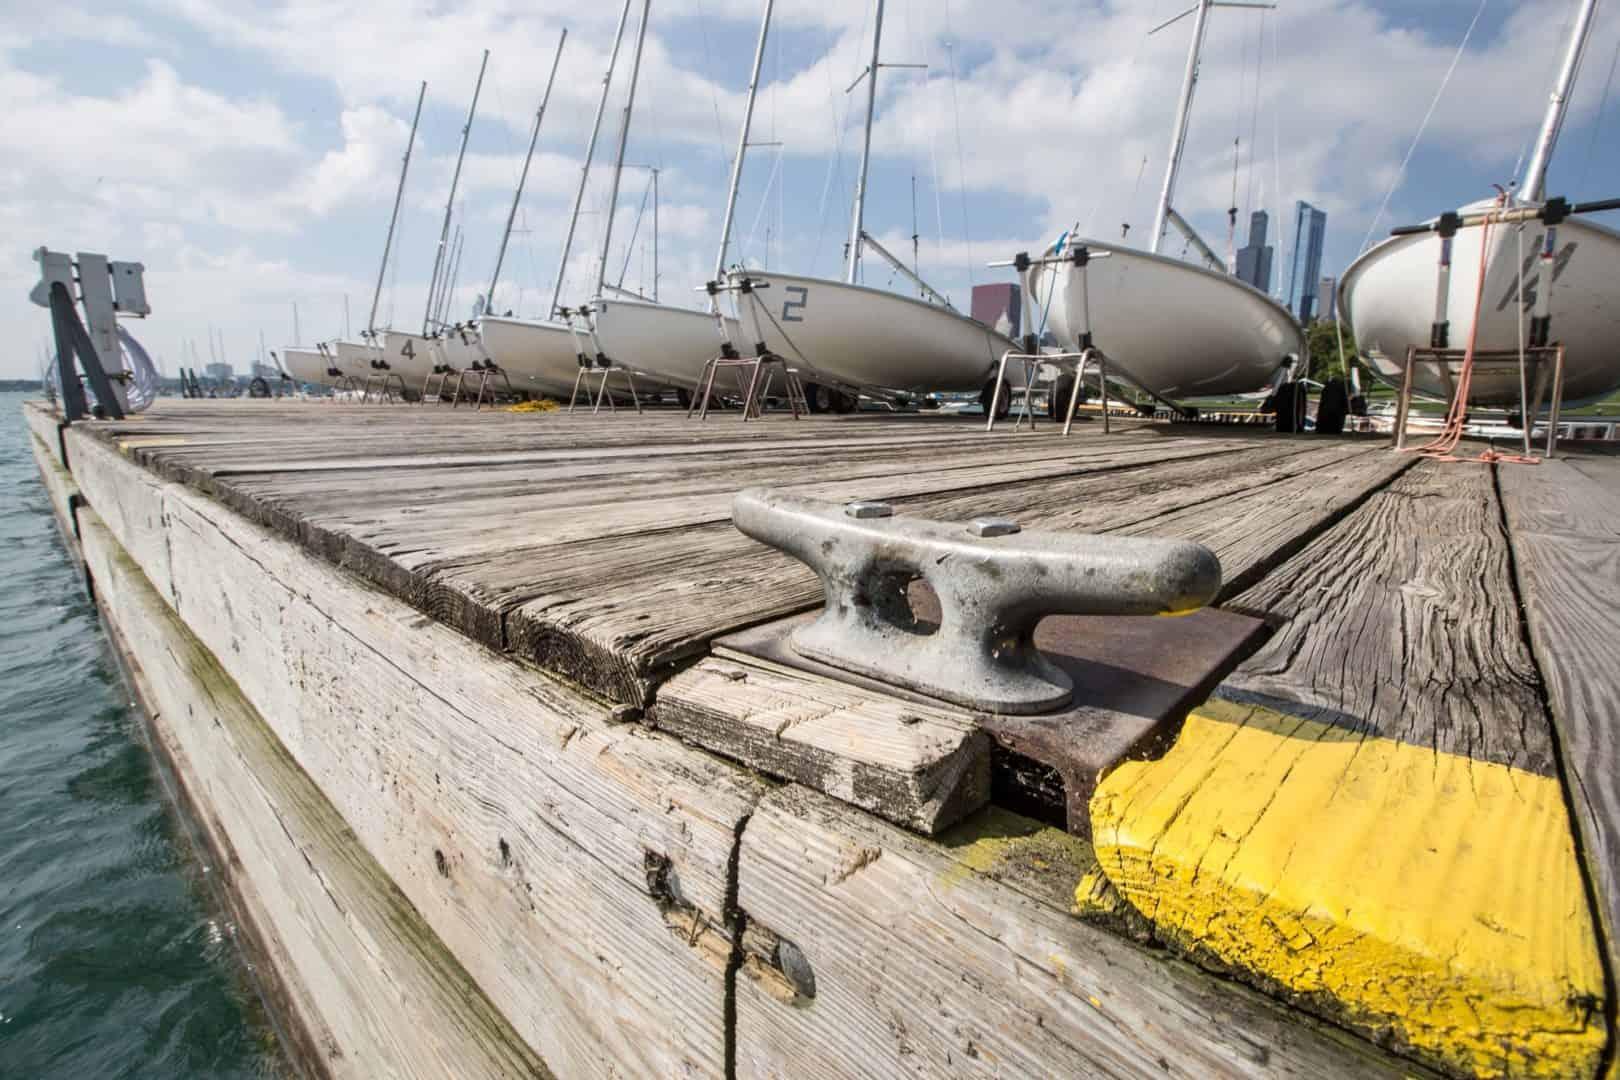 Boating 2 & 3 - Beyond Basic Boating & Intro to Navigation 9